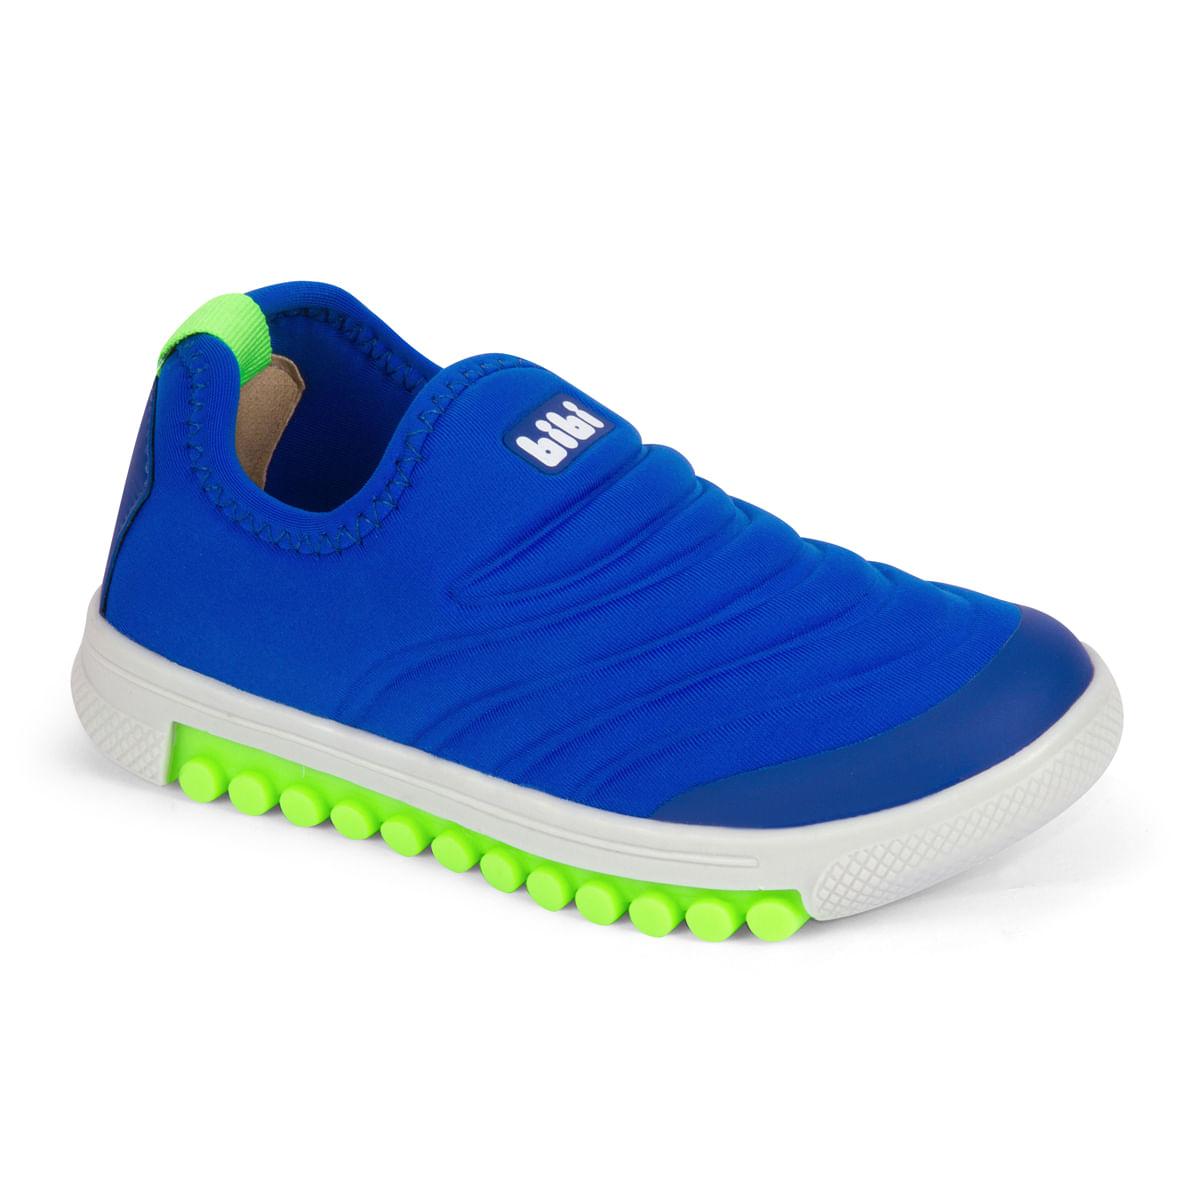 b55688a154 Tênis Infantil Masculino Bibi Azul Roller New 679463 - Bibi Calçados